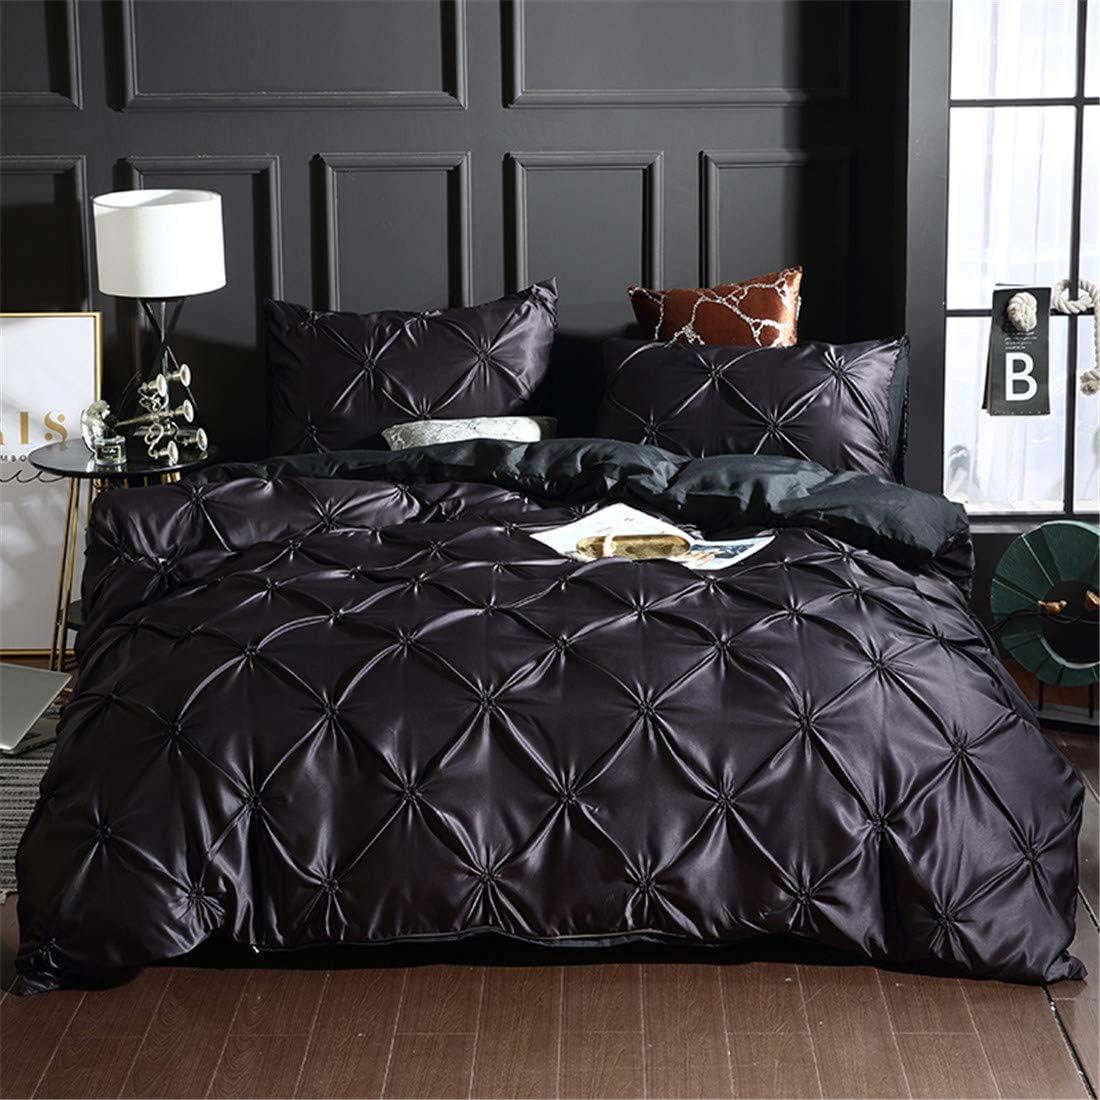 Pinch Pleated Duvet Cover Set Black Memphis Mall Pi Size Silk Like Twin Satin Tulsa Mall